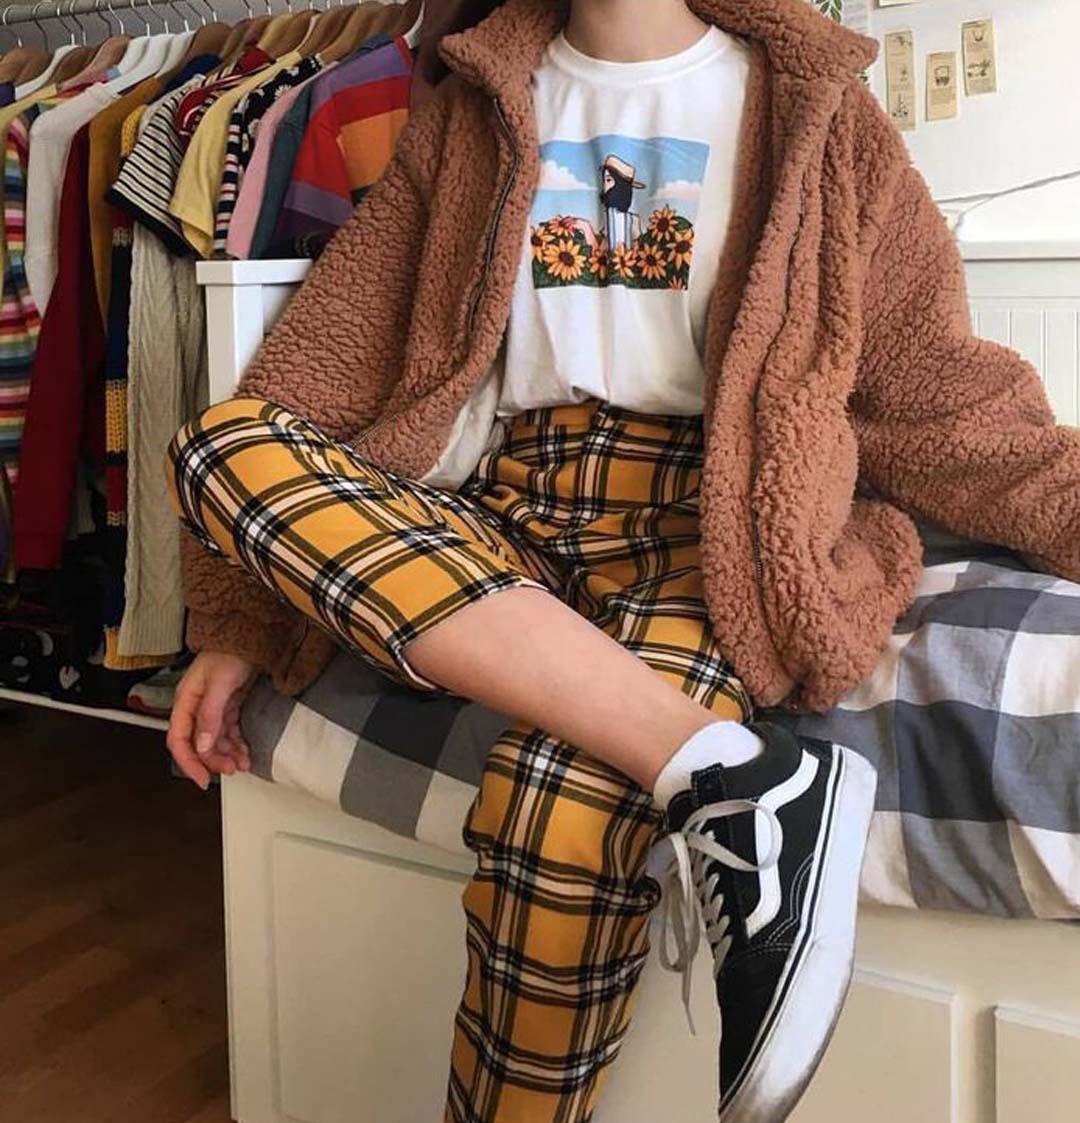 AESTHETIC STYLE: soft girl, vsco girl, soft grunge, e-girl clothing styles and others